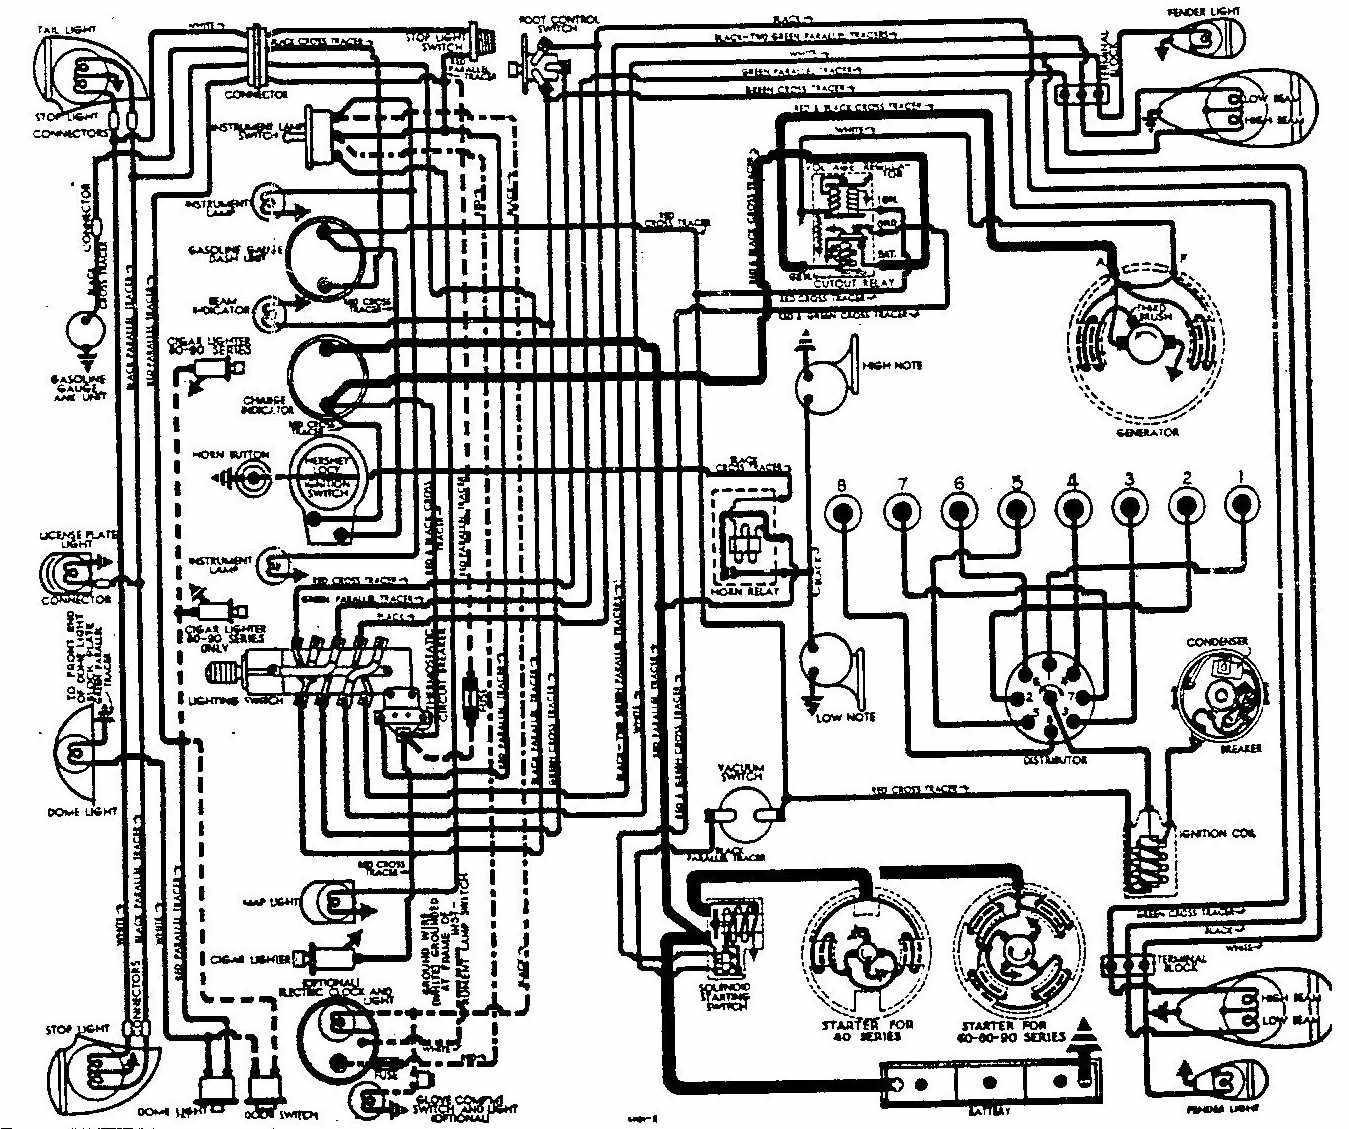 Ford 4600 Wiring Diagram Light - Wiring Diagrams20.d2.lesvignoblesguimberteau.fr